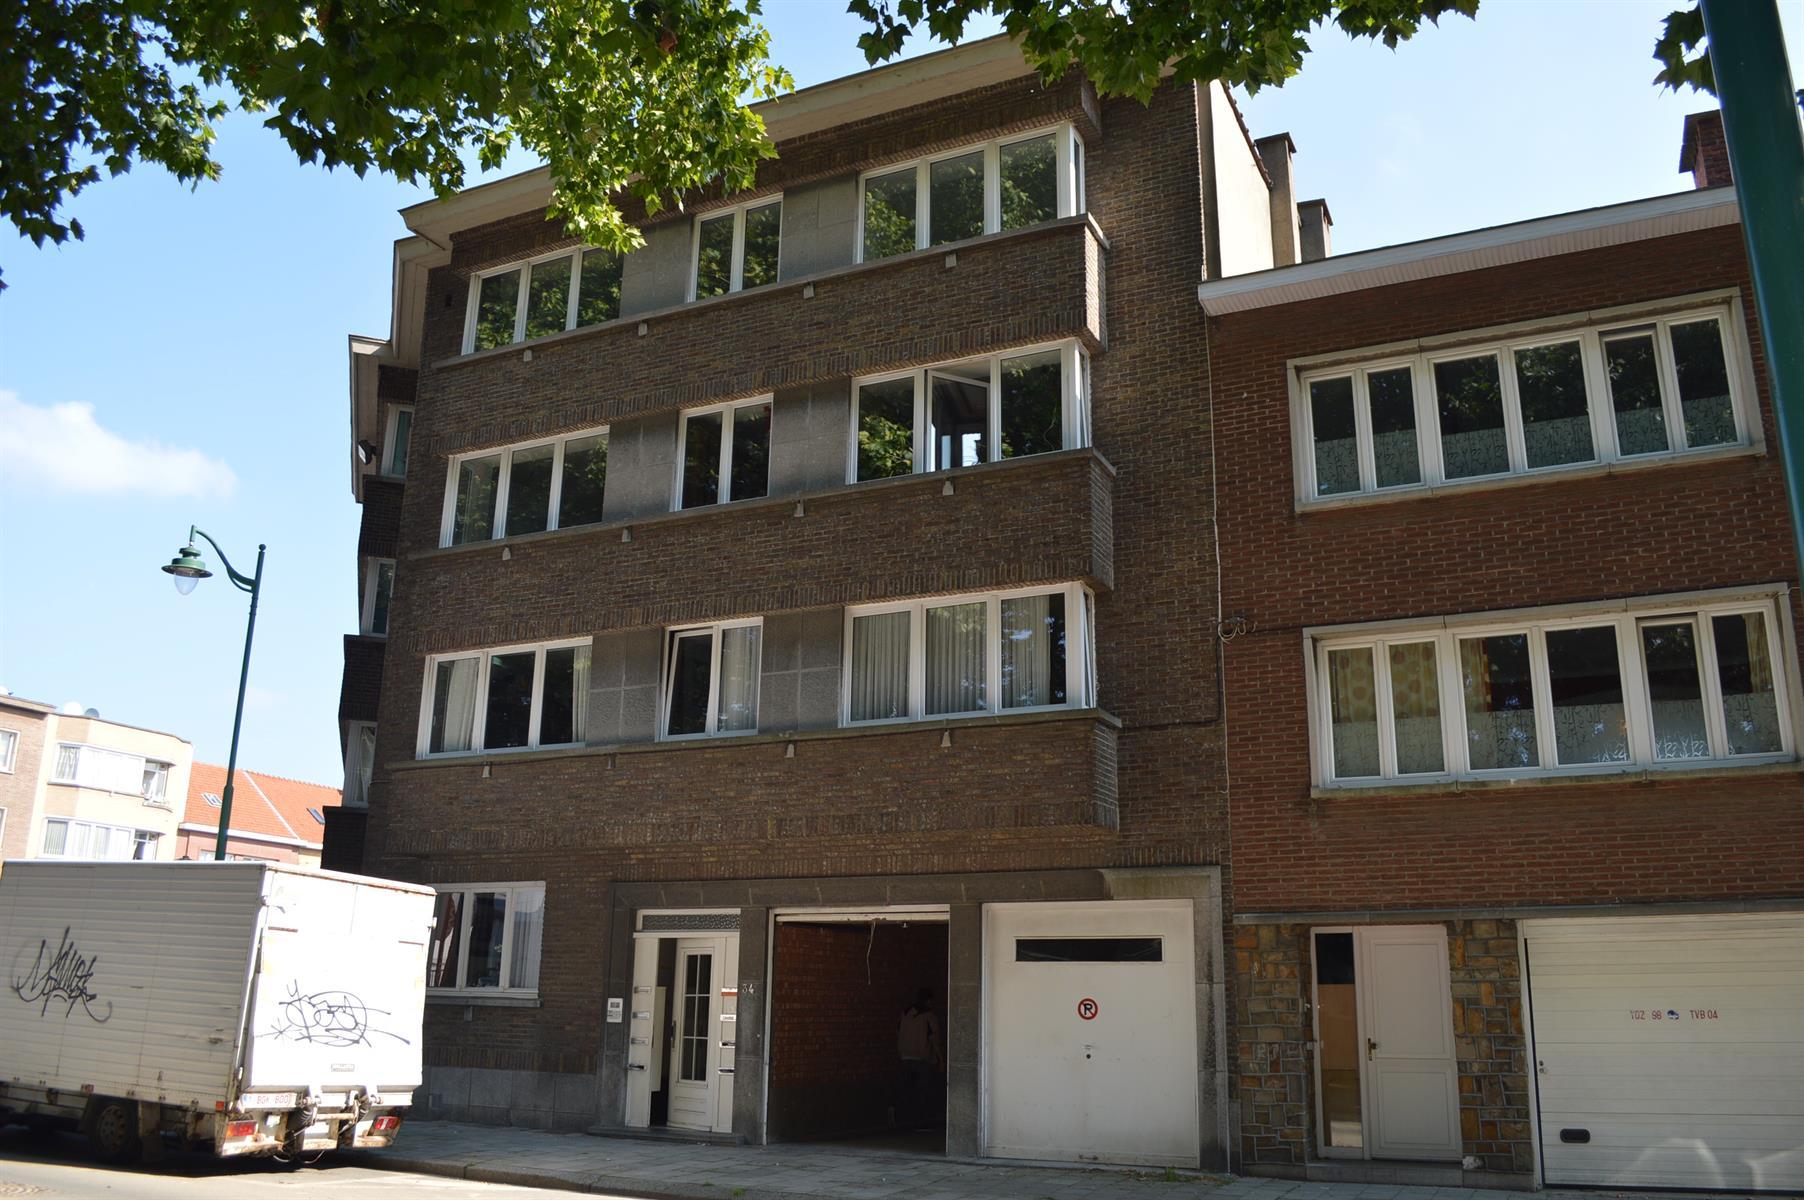 Appartement - Molenbeek-Saint-Jean - #4252746-9